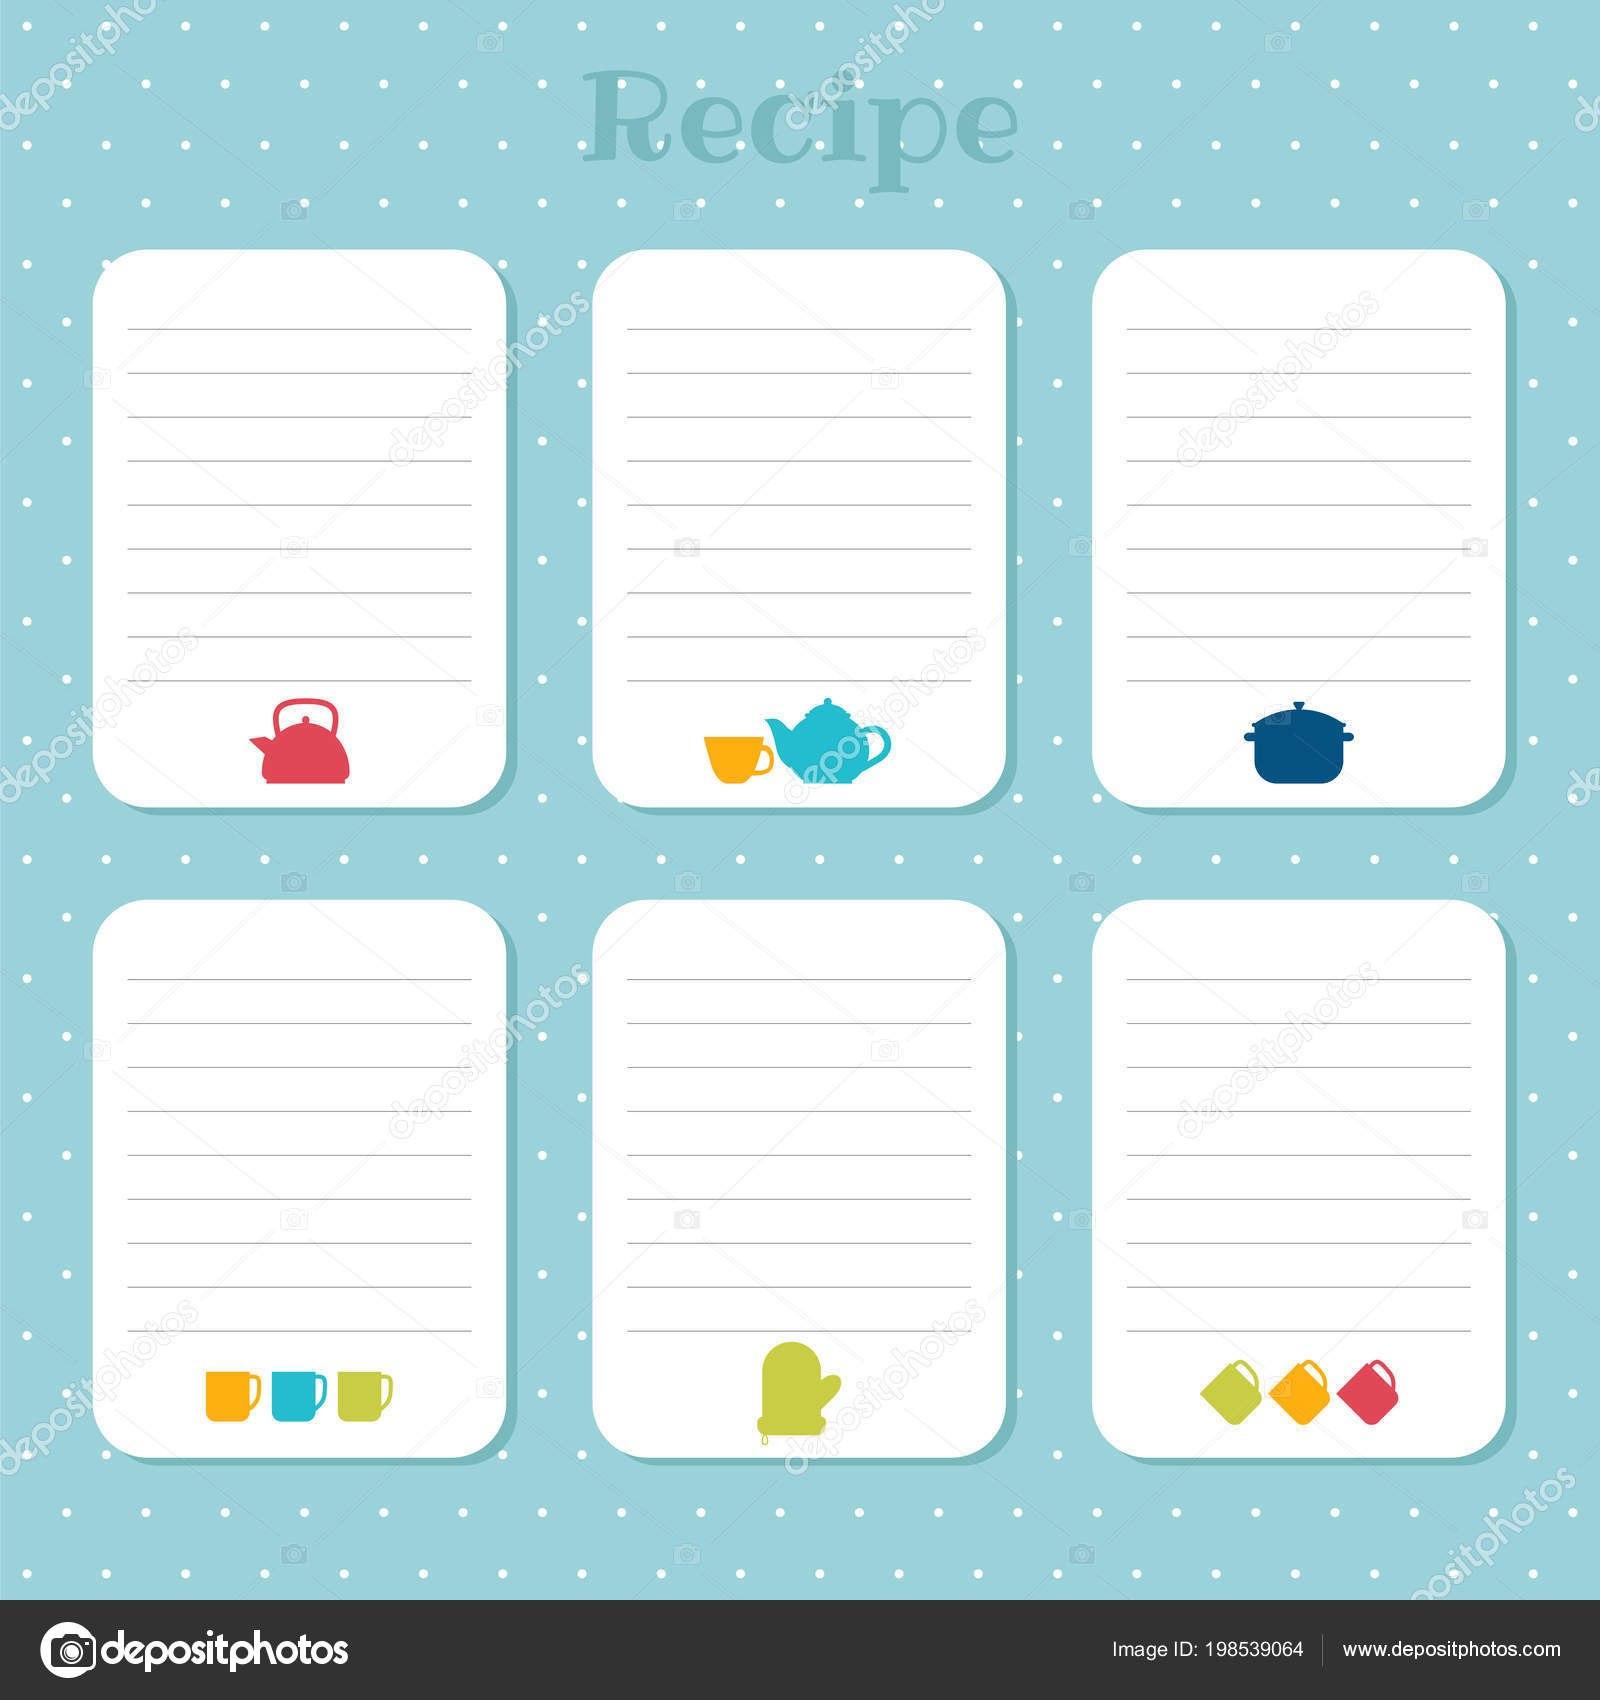 Recipe Cards Set Cooking Card Templates Restaurant Cafe Bakery Fast Regarding Restaurant Recipe Card Template